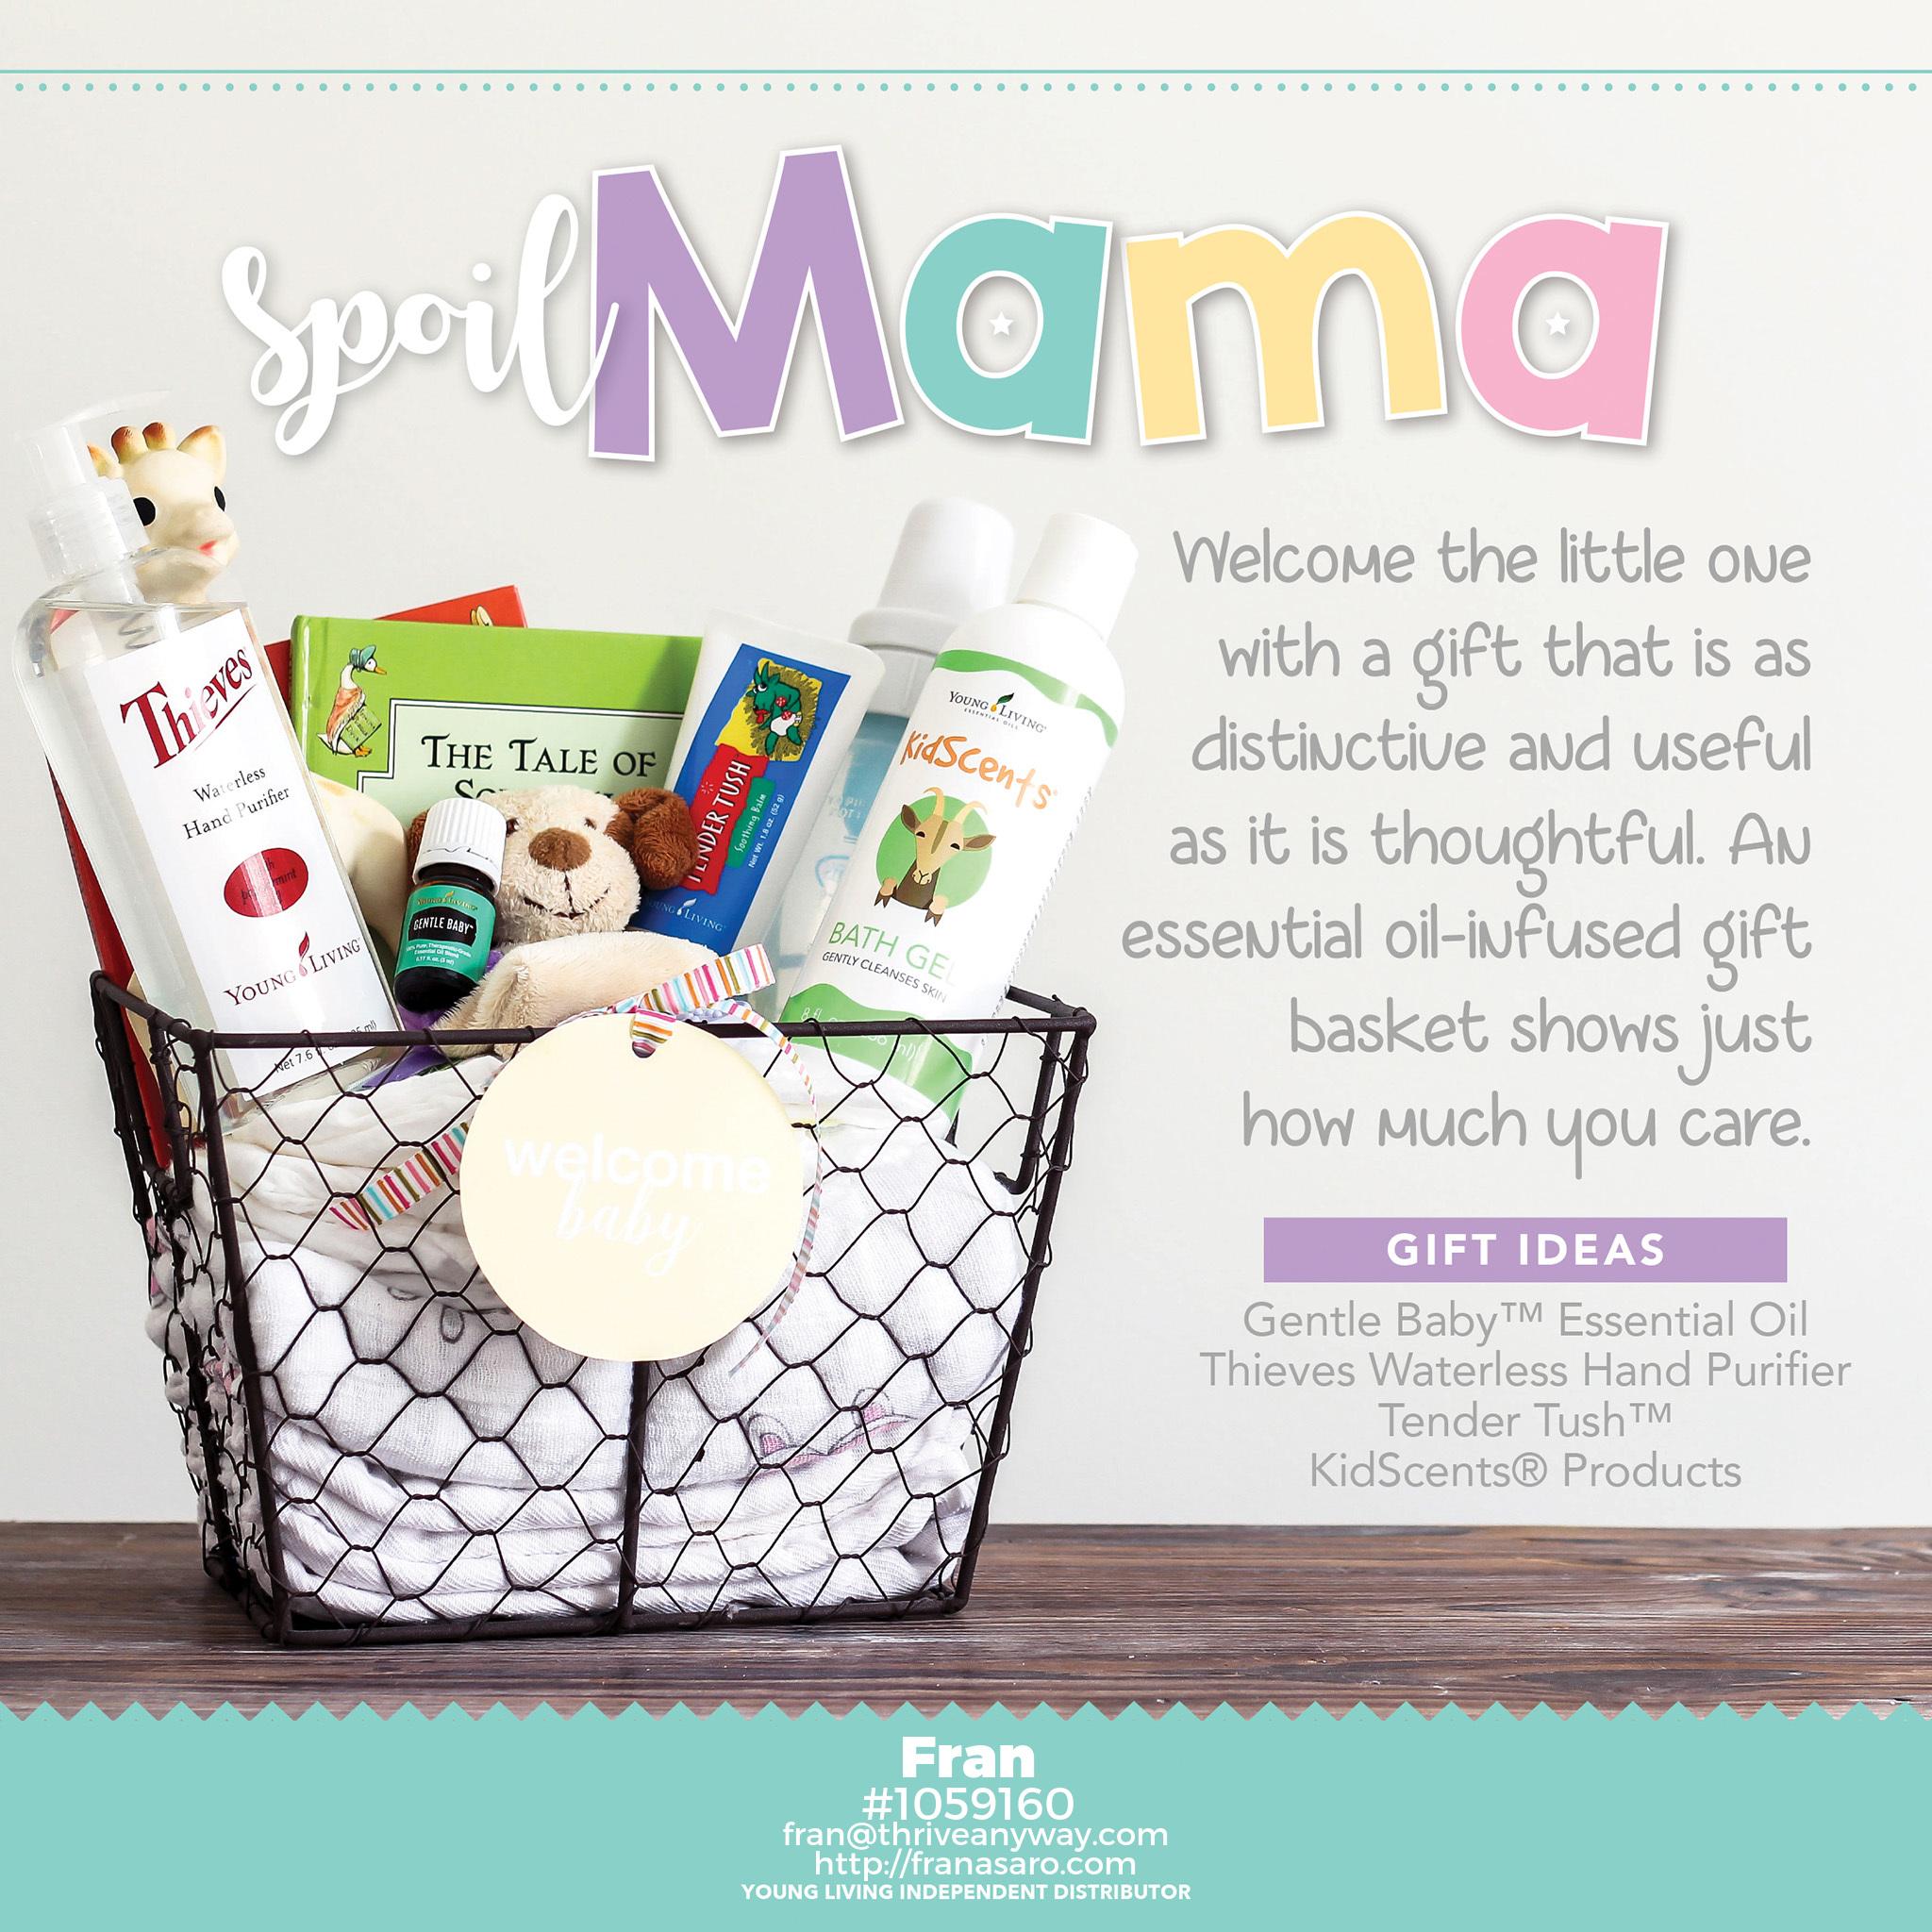 spoiled mama